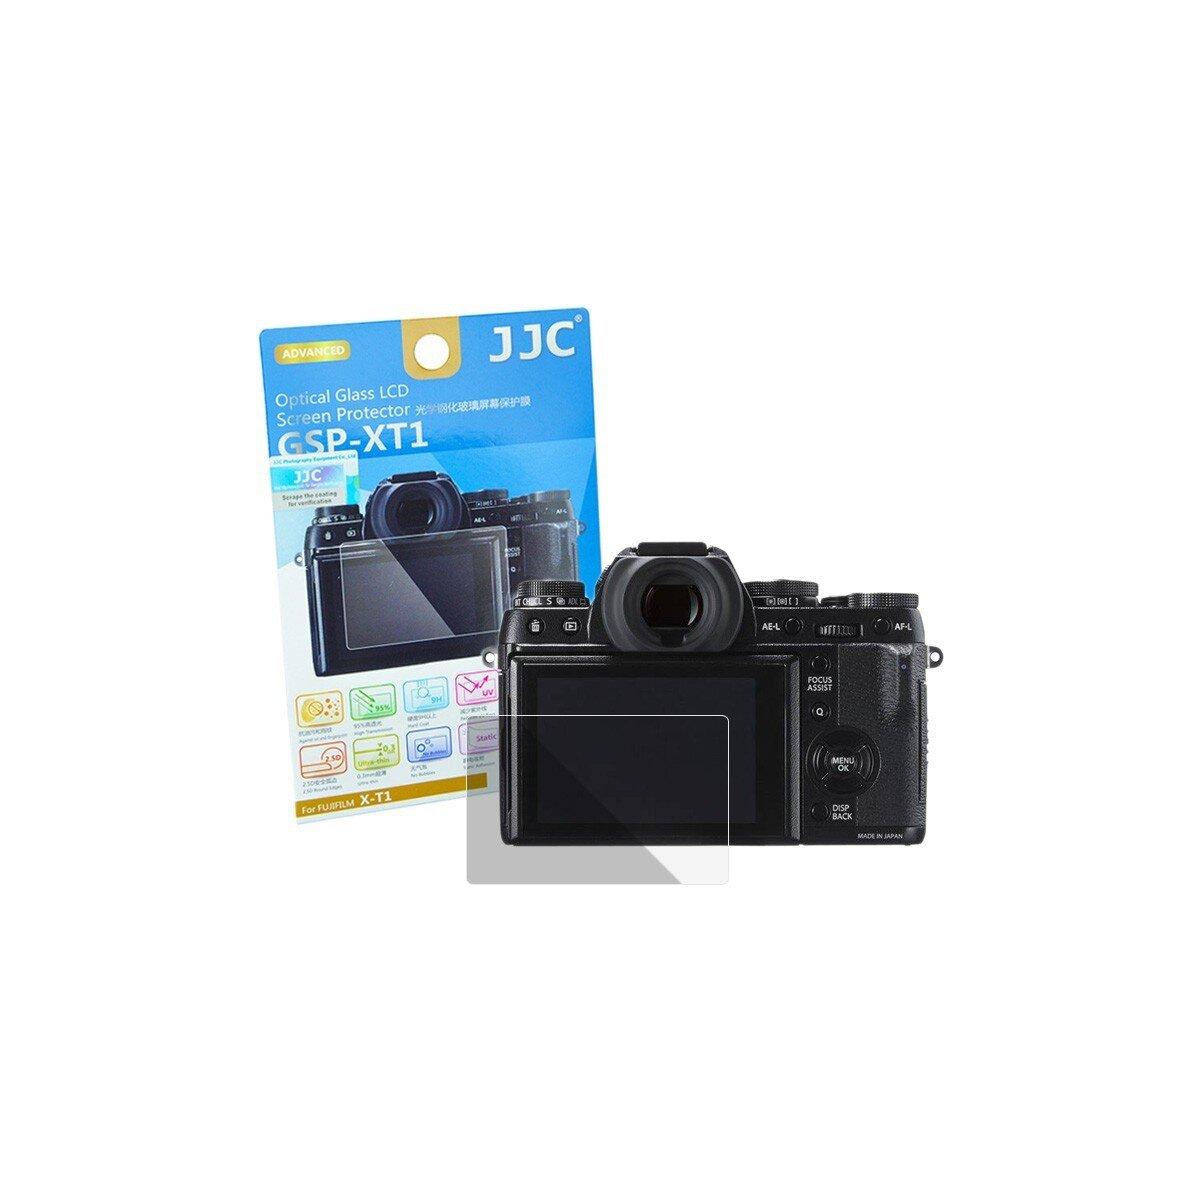 Hochwertiger Displayschutz Screen Protector aus gehaertetem Echtglas, passend fuer Fujifilm X-T1, X-T2 - JJC GSP-XT1